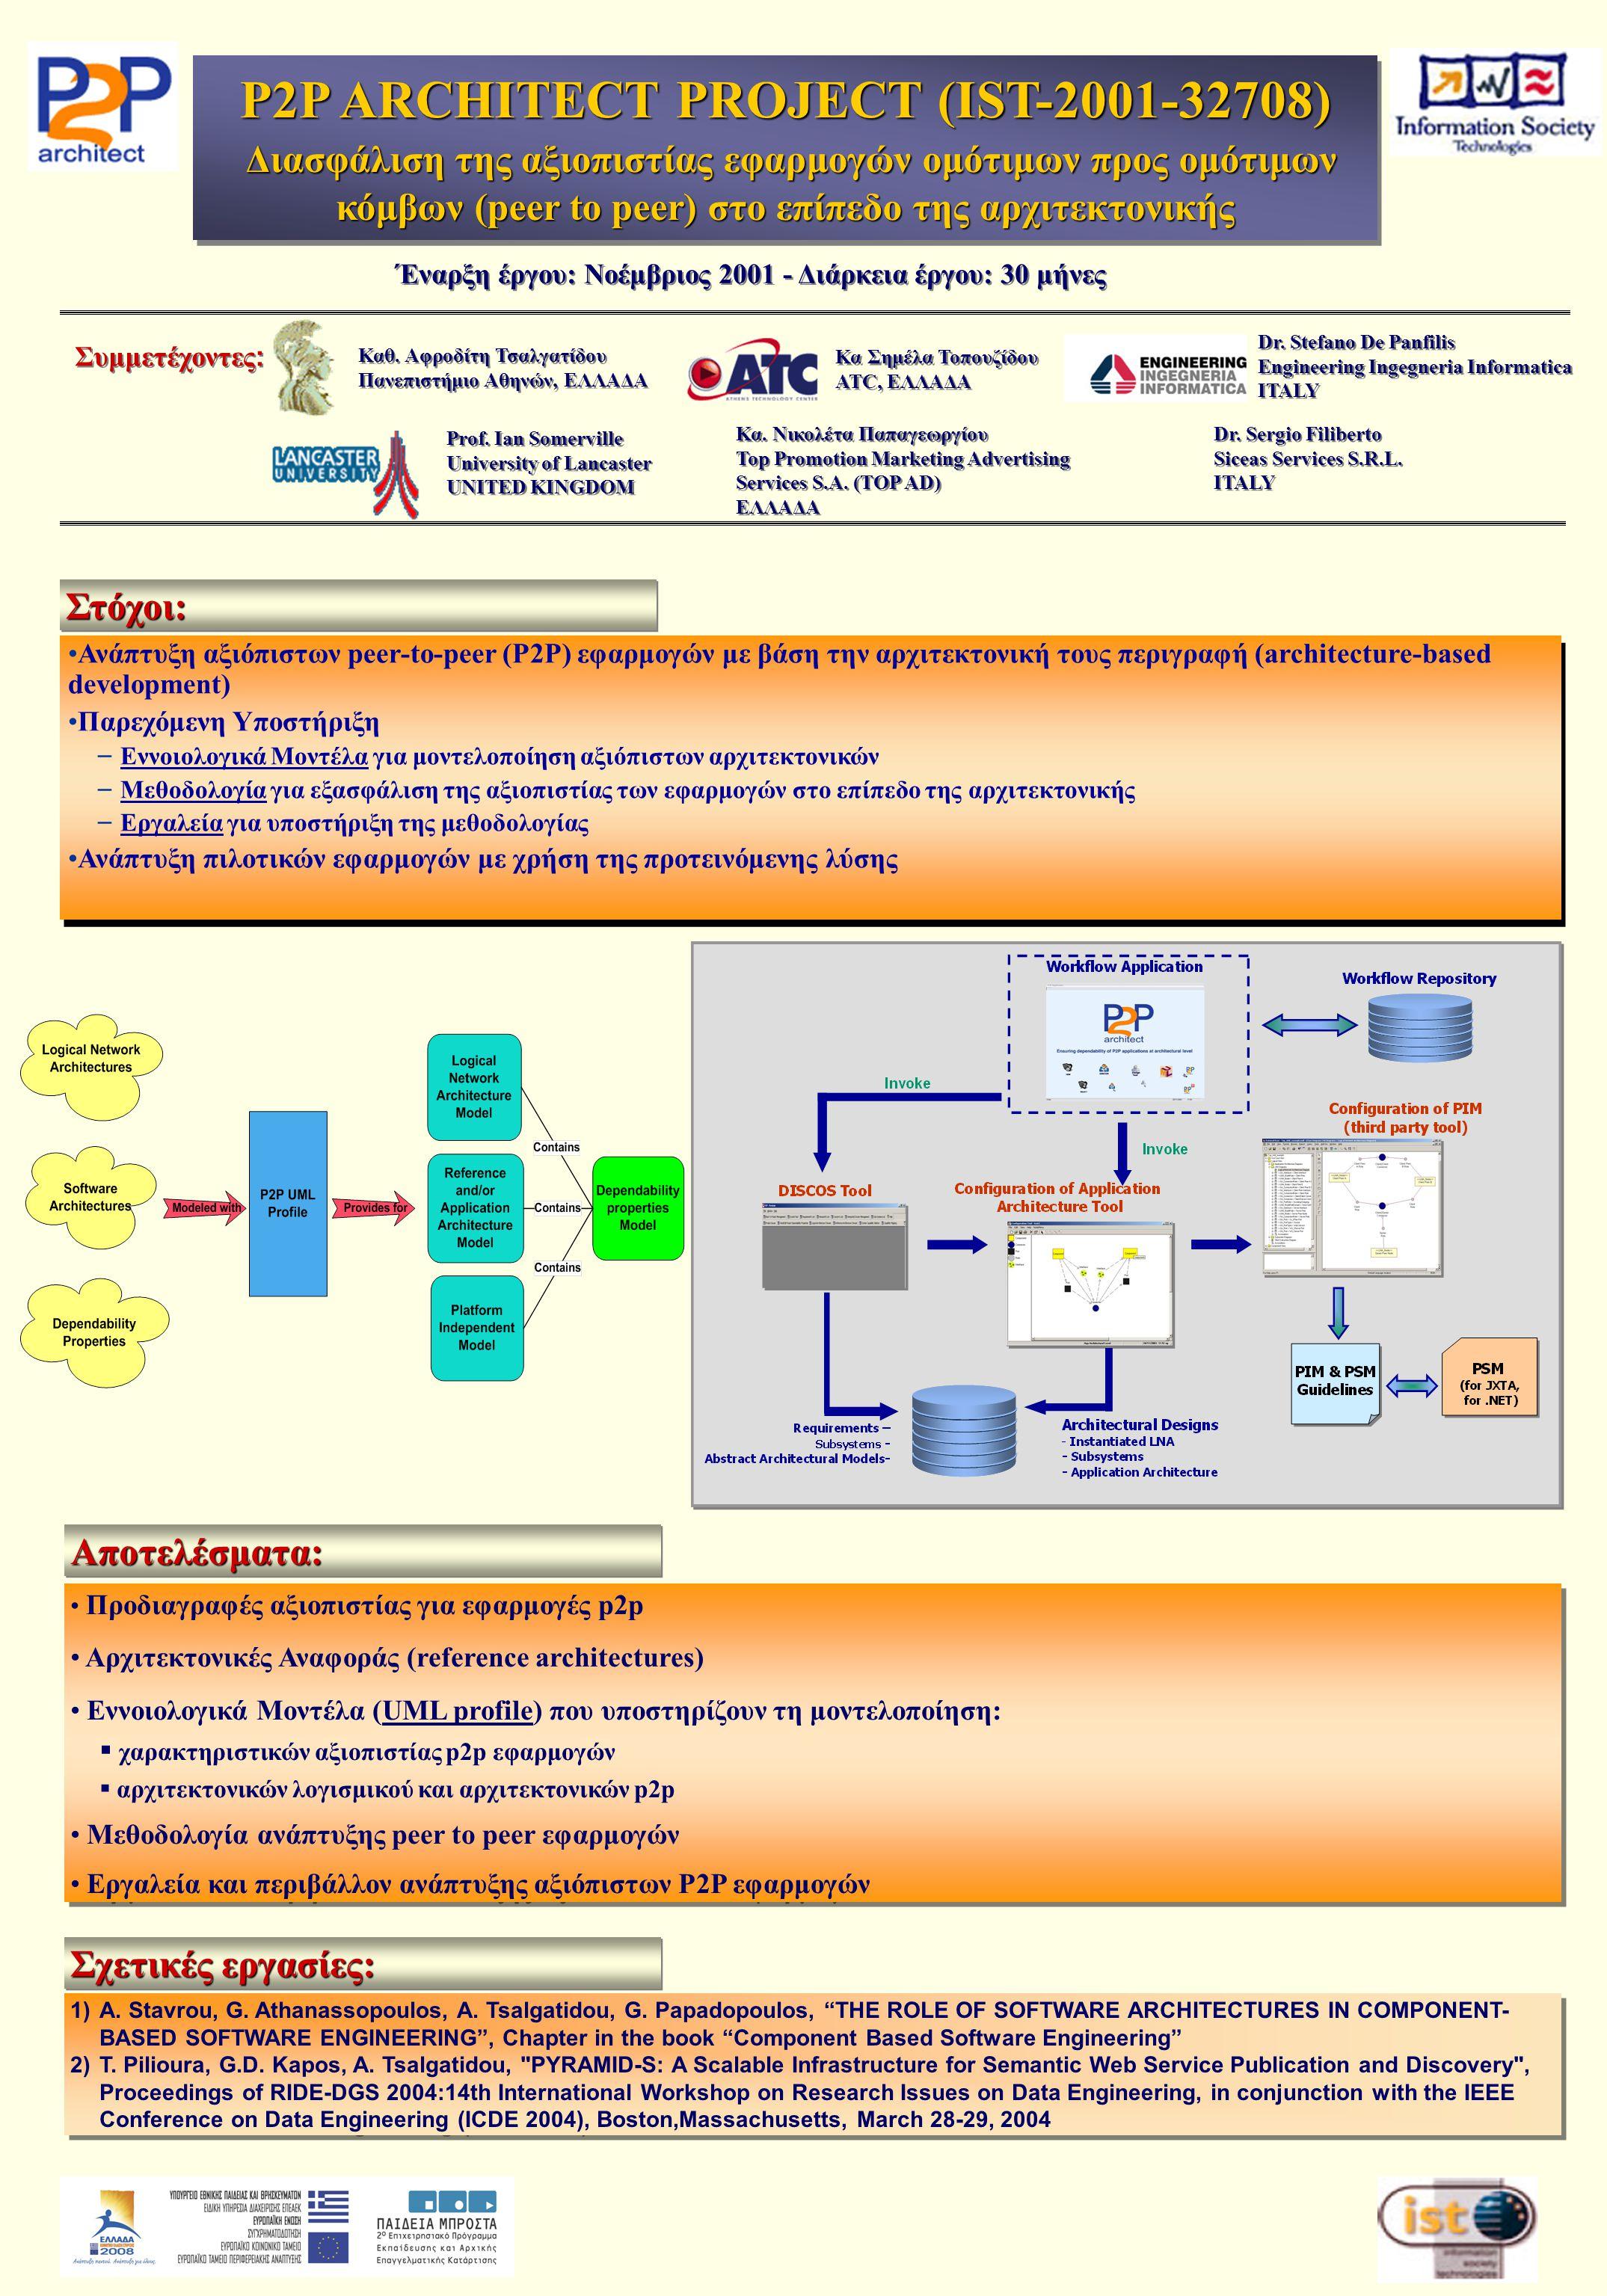 P2P ARCHITECT PROJECT (IST-2001-32708) Διασφάλιση της αξιοπιστίας εφαρμογών ομότιμων προς ομότιμων κόμβων (peer to peer) στο επίπεδο της αρχιτεκτονικής Διασφάλιση της αξιοπιστίας εφαρμογών ομότιμων προς ομότιμων κόμβων (peer to peer) στο επίπεδο της αρχιτεκτονικής P2P ARCHITECT PROJECT (IST-2001-32708) Διασφάλιση της αξιοπιστίας εφαρμογών ομότιμων προς ομότιμων κόμβων (peer to peer) στο επίπεδο της αρχιτεκτονικής Διασφάλιση της αξιοπιστίας εφαρμογών ομότιμων προς ομότιμων κόμβων (peer to peer) στο επίπεδο της αρχιτεκτονικής Ανάπτυξη αξιόπιστων peer-to-peer (P2P) εφαρμογών με βάση την αρχιτεκτονική τους περιγραφή (architecture-based development) Παρεχόμενη Υποστήριξη – Εννοιολογικά Μοντέλα για μοντελοποίηση αξιόπιστων αρχιτεκτονικών – Μεθοδολογία για εξασφάλιση της αξιοπιστίας των εφαρμογών στο επίπεδο της αρχιτεκτονικής – Εργαλεία για υποστήριξη της μεθοδολογίας Ανάπτυξη πιλοτικών εφαρμογών με χρήση της προτεινόμενης λύσης Ανάπτυξη αξιόπιστων peer-to-peer (P2P) εφαρμογών με βάση την αρχιτεκτονική τους περιγραφή (architecture-based development) Παρεχόμενη Υποστήριξη – Εννοιολογικά Μοντέλα για μοντελοποίηση αξιόπιστων αρχιτεκτονικών – Μεθοδολογία για εξασφάλιση της αξιοπιστίας των εφαρμογών στο επίπεδο της αρχιτεκτονικής – Εργαλεία για υποστήριξη της μεθοδολογίας Ανάπτυξη πιλοτικών εφαρμογών με χρήση της προτεινόμενης λύσης 1)A.